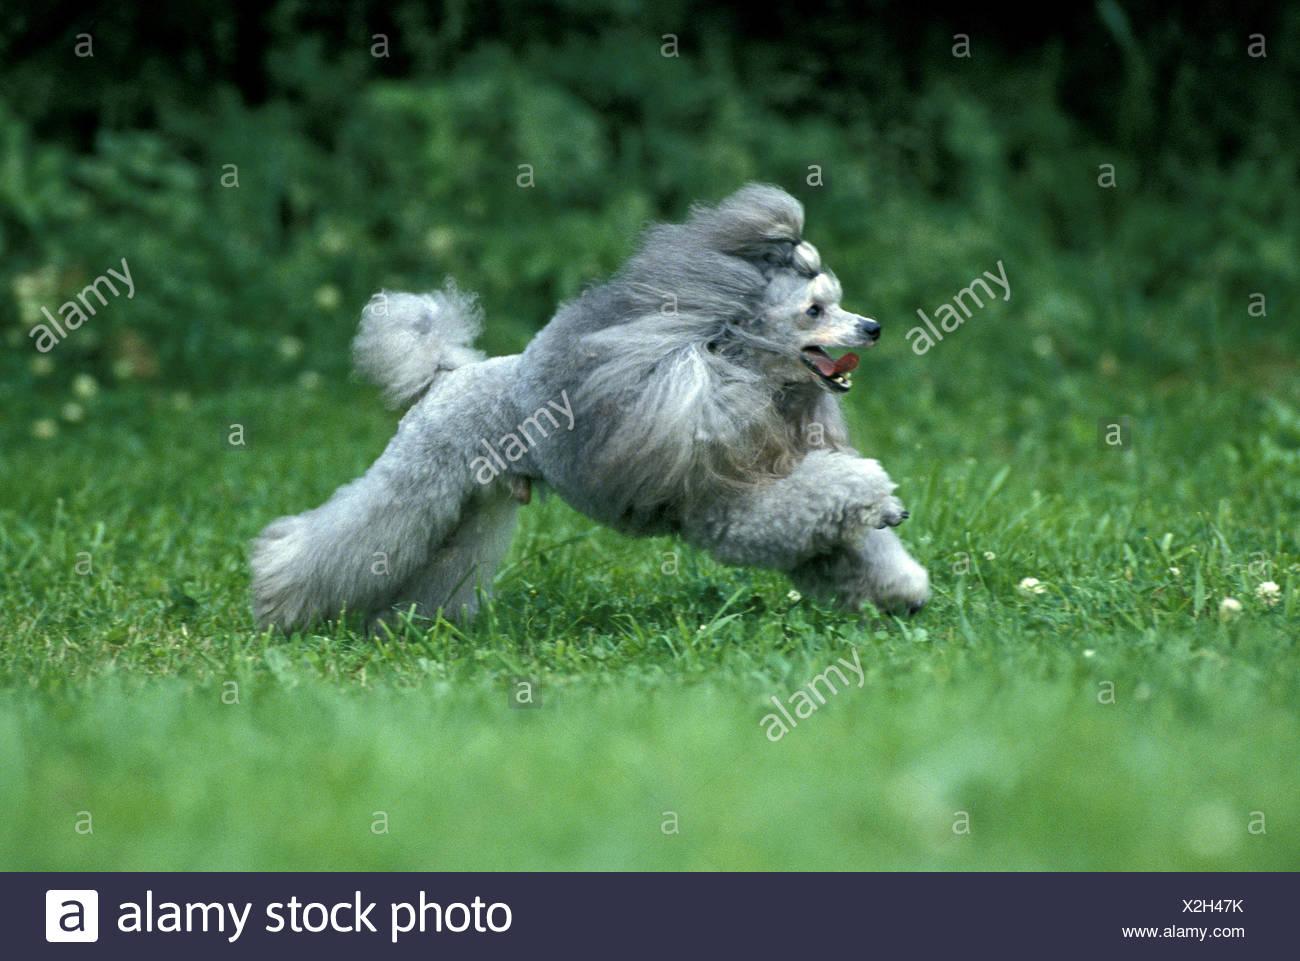 Grey Miniature Poodle Dog, Male running - Stock Image